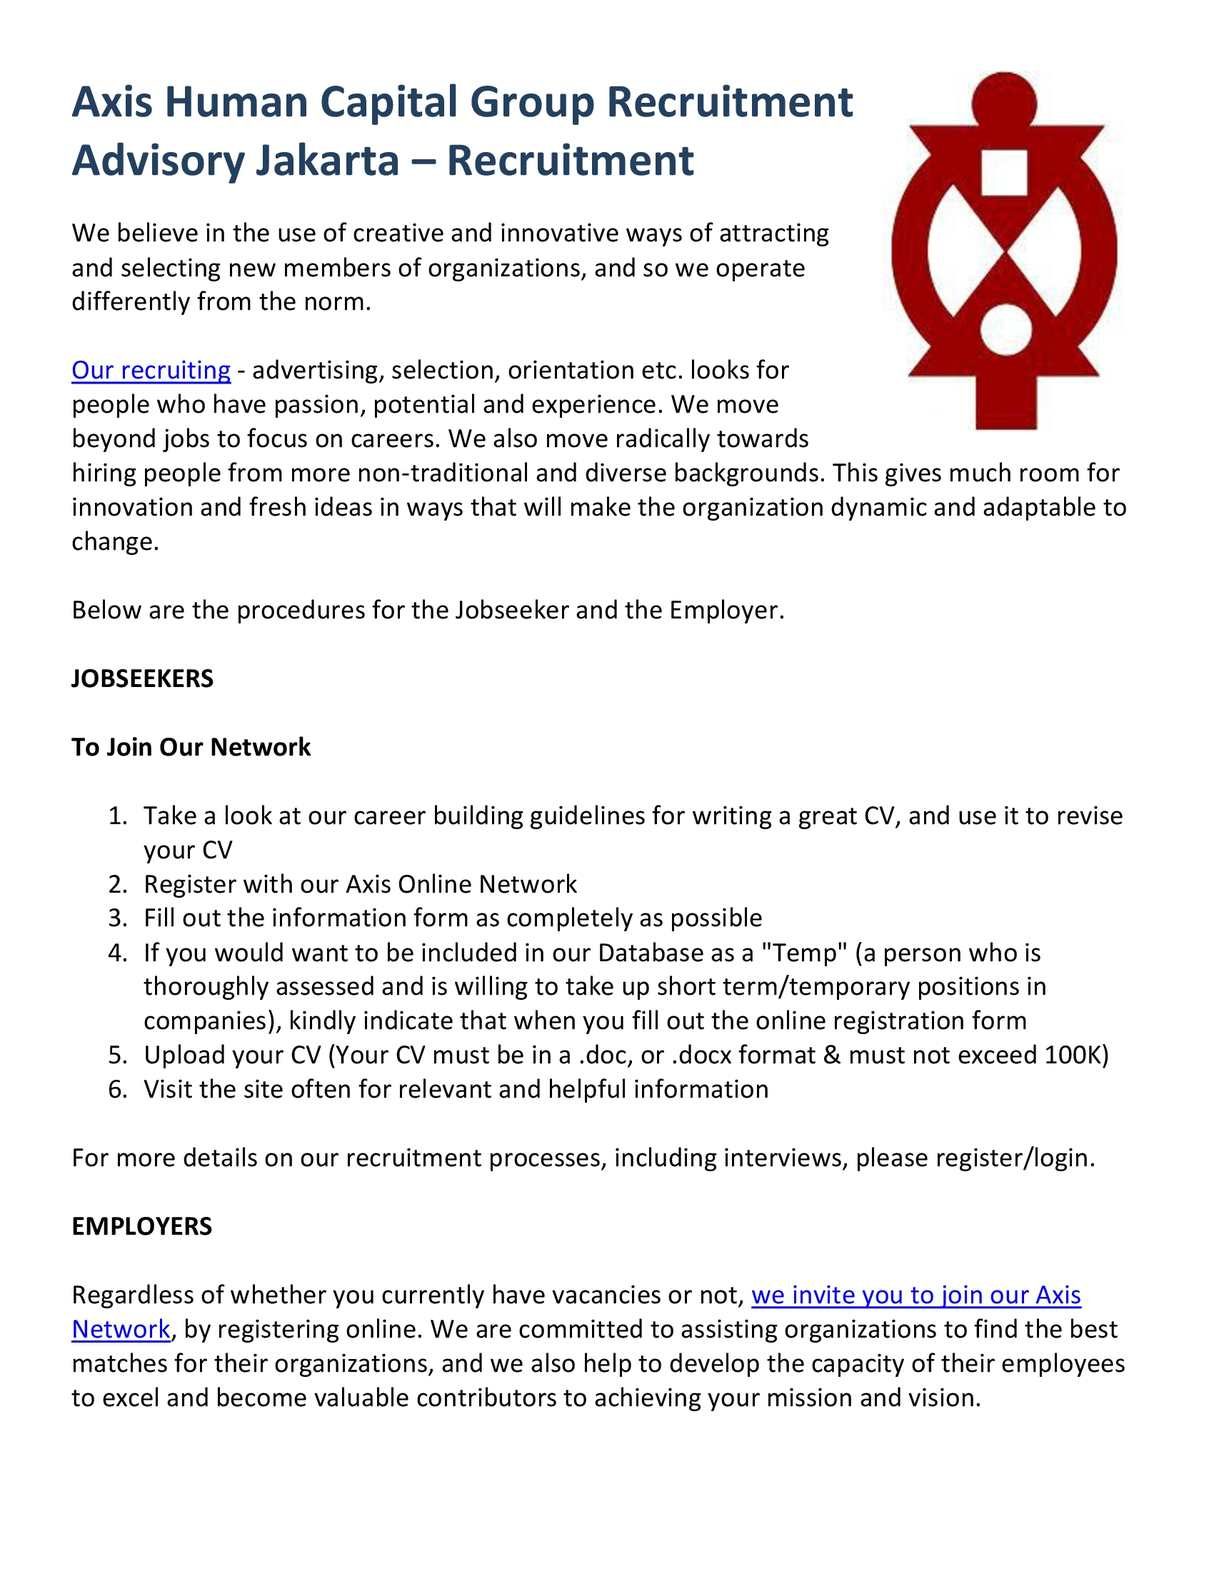 Calaméo - Axis Human Capital Group Recruitment Advisory Jakarta